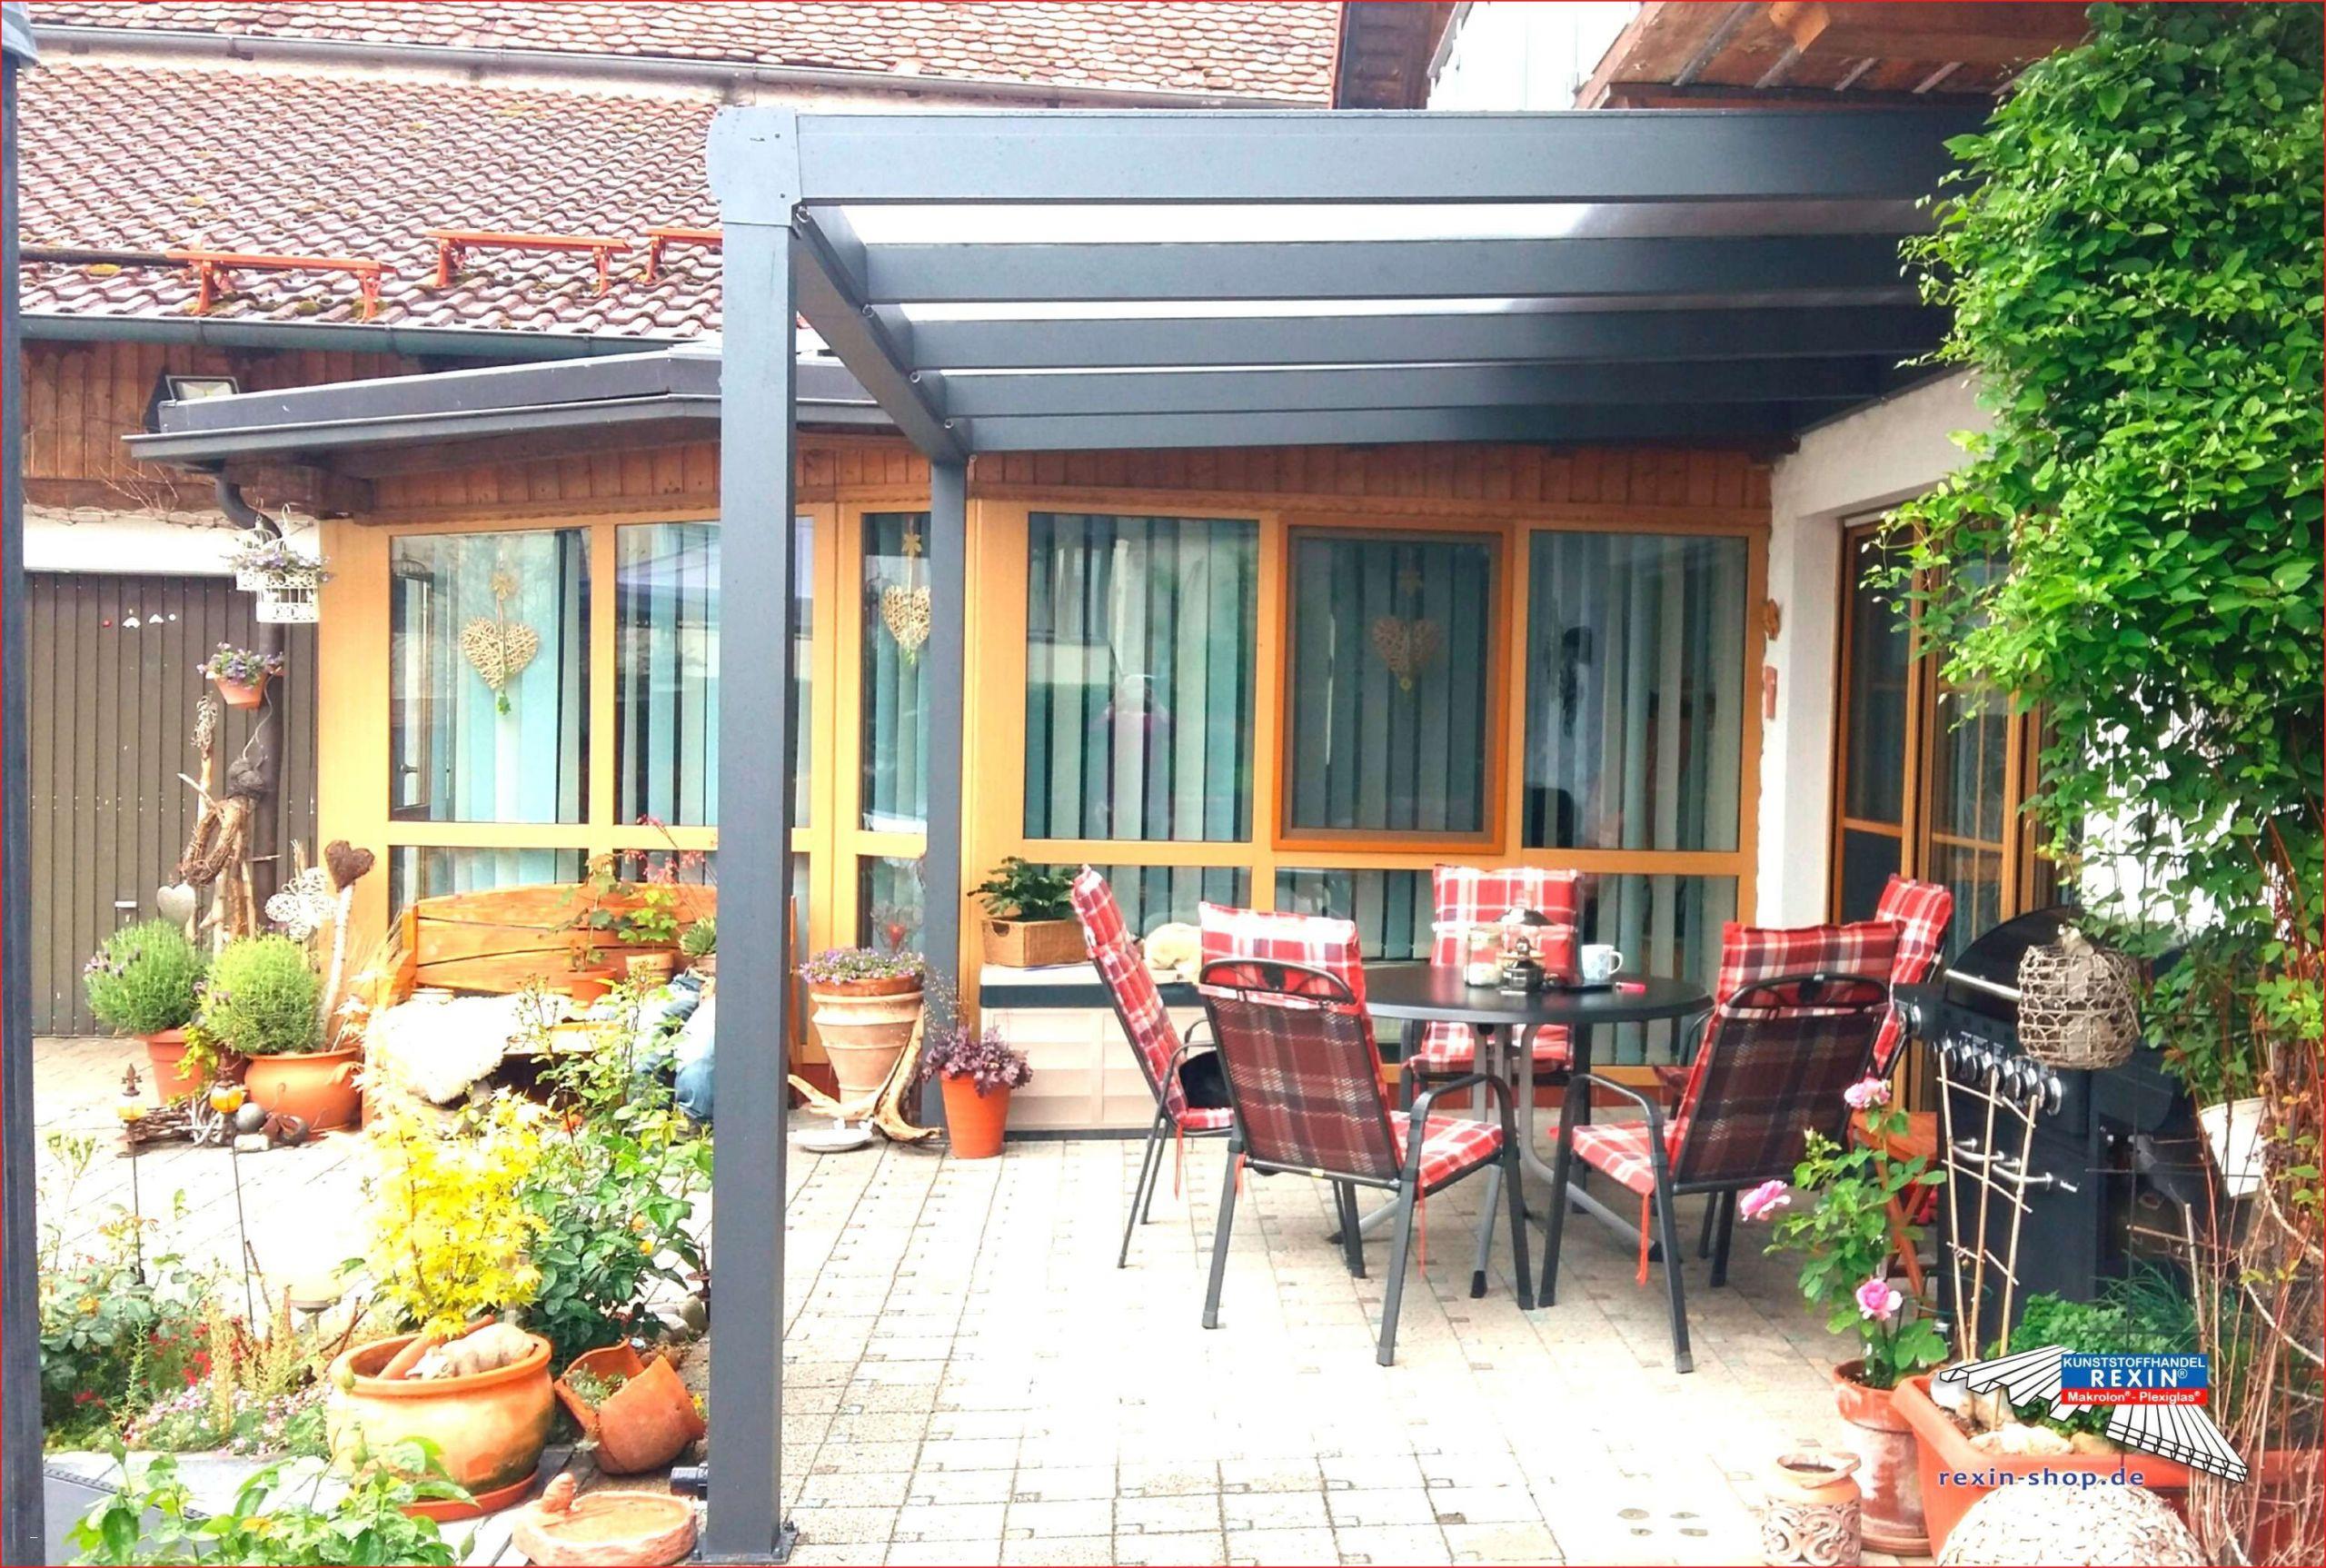 Canape Pour Veranda Nouveau Ment Planifier Veranda Image De Veranda Idée